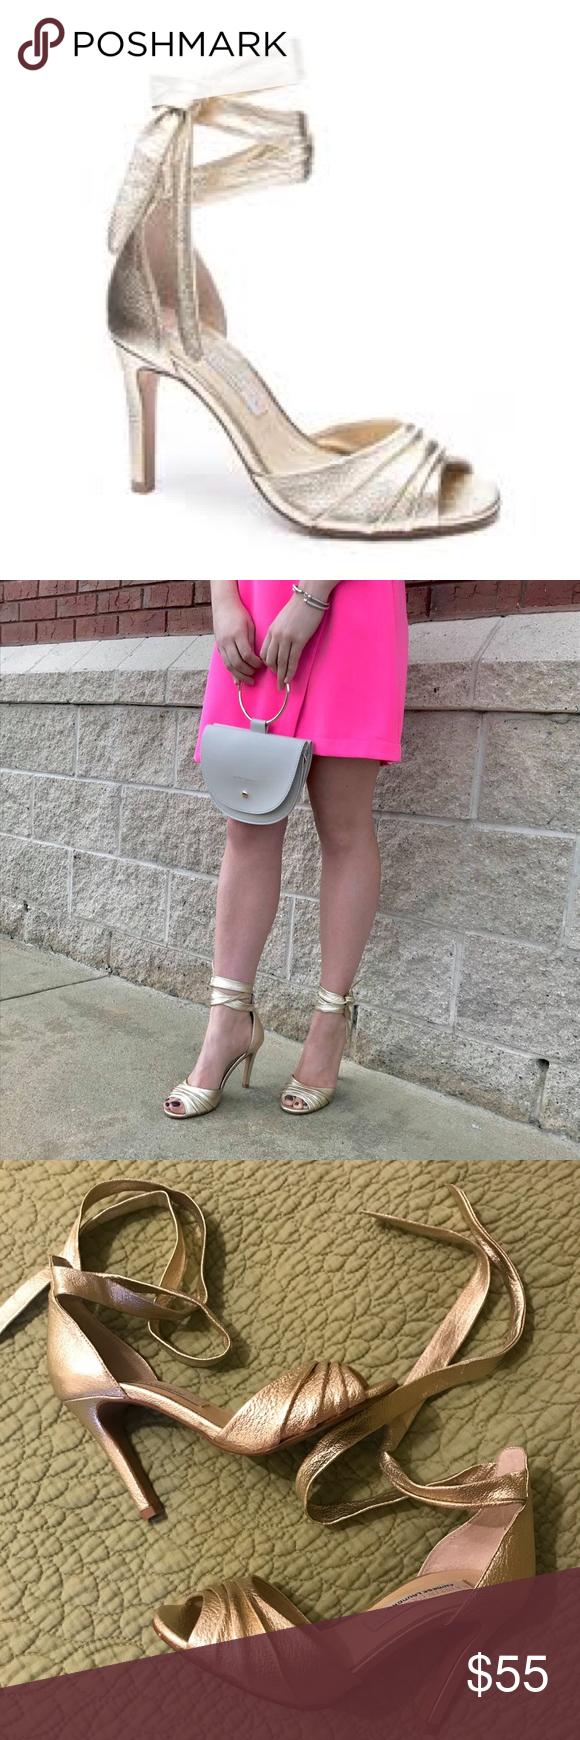 eac209ee0 Chinese Laundry Kristin Cavallari Lilac Pumps 5.5 Peep toe - Textured vamp  - Wraparound ankle straps - Slip-on - Lightly padded footbed - Stiletto  heel ...